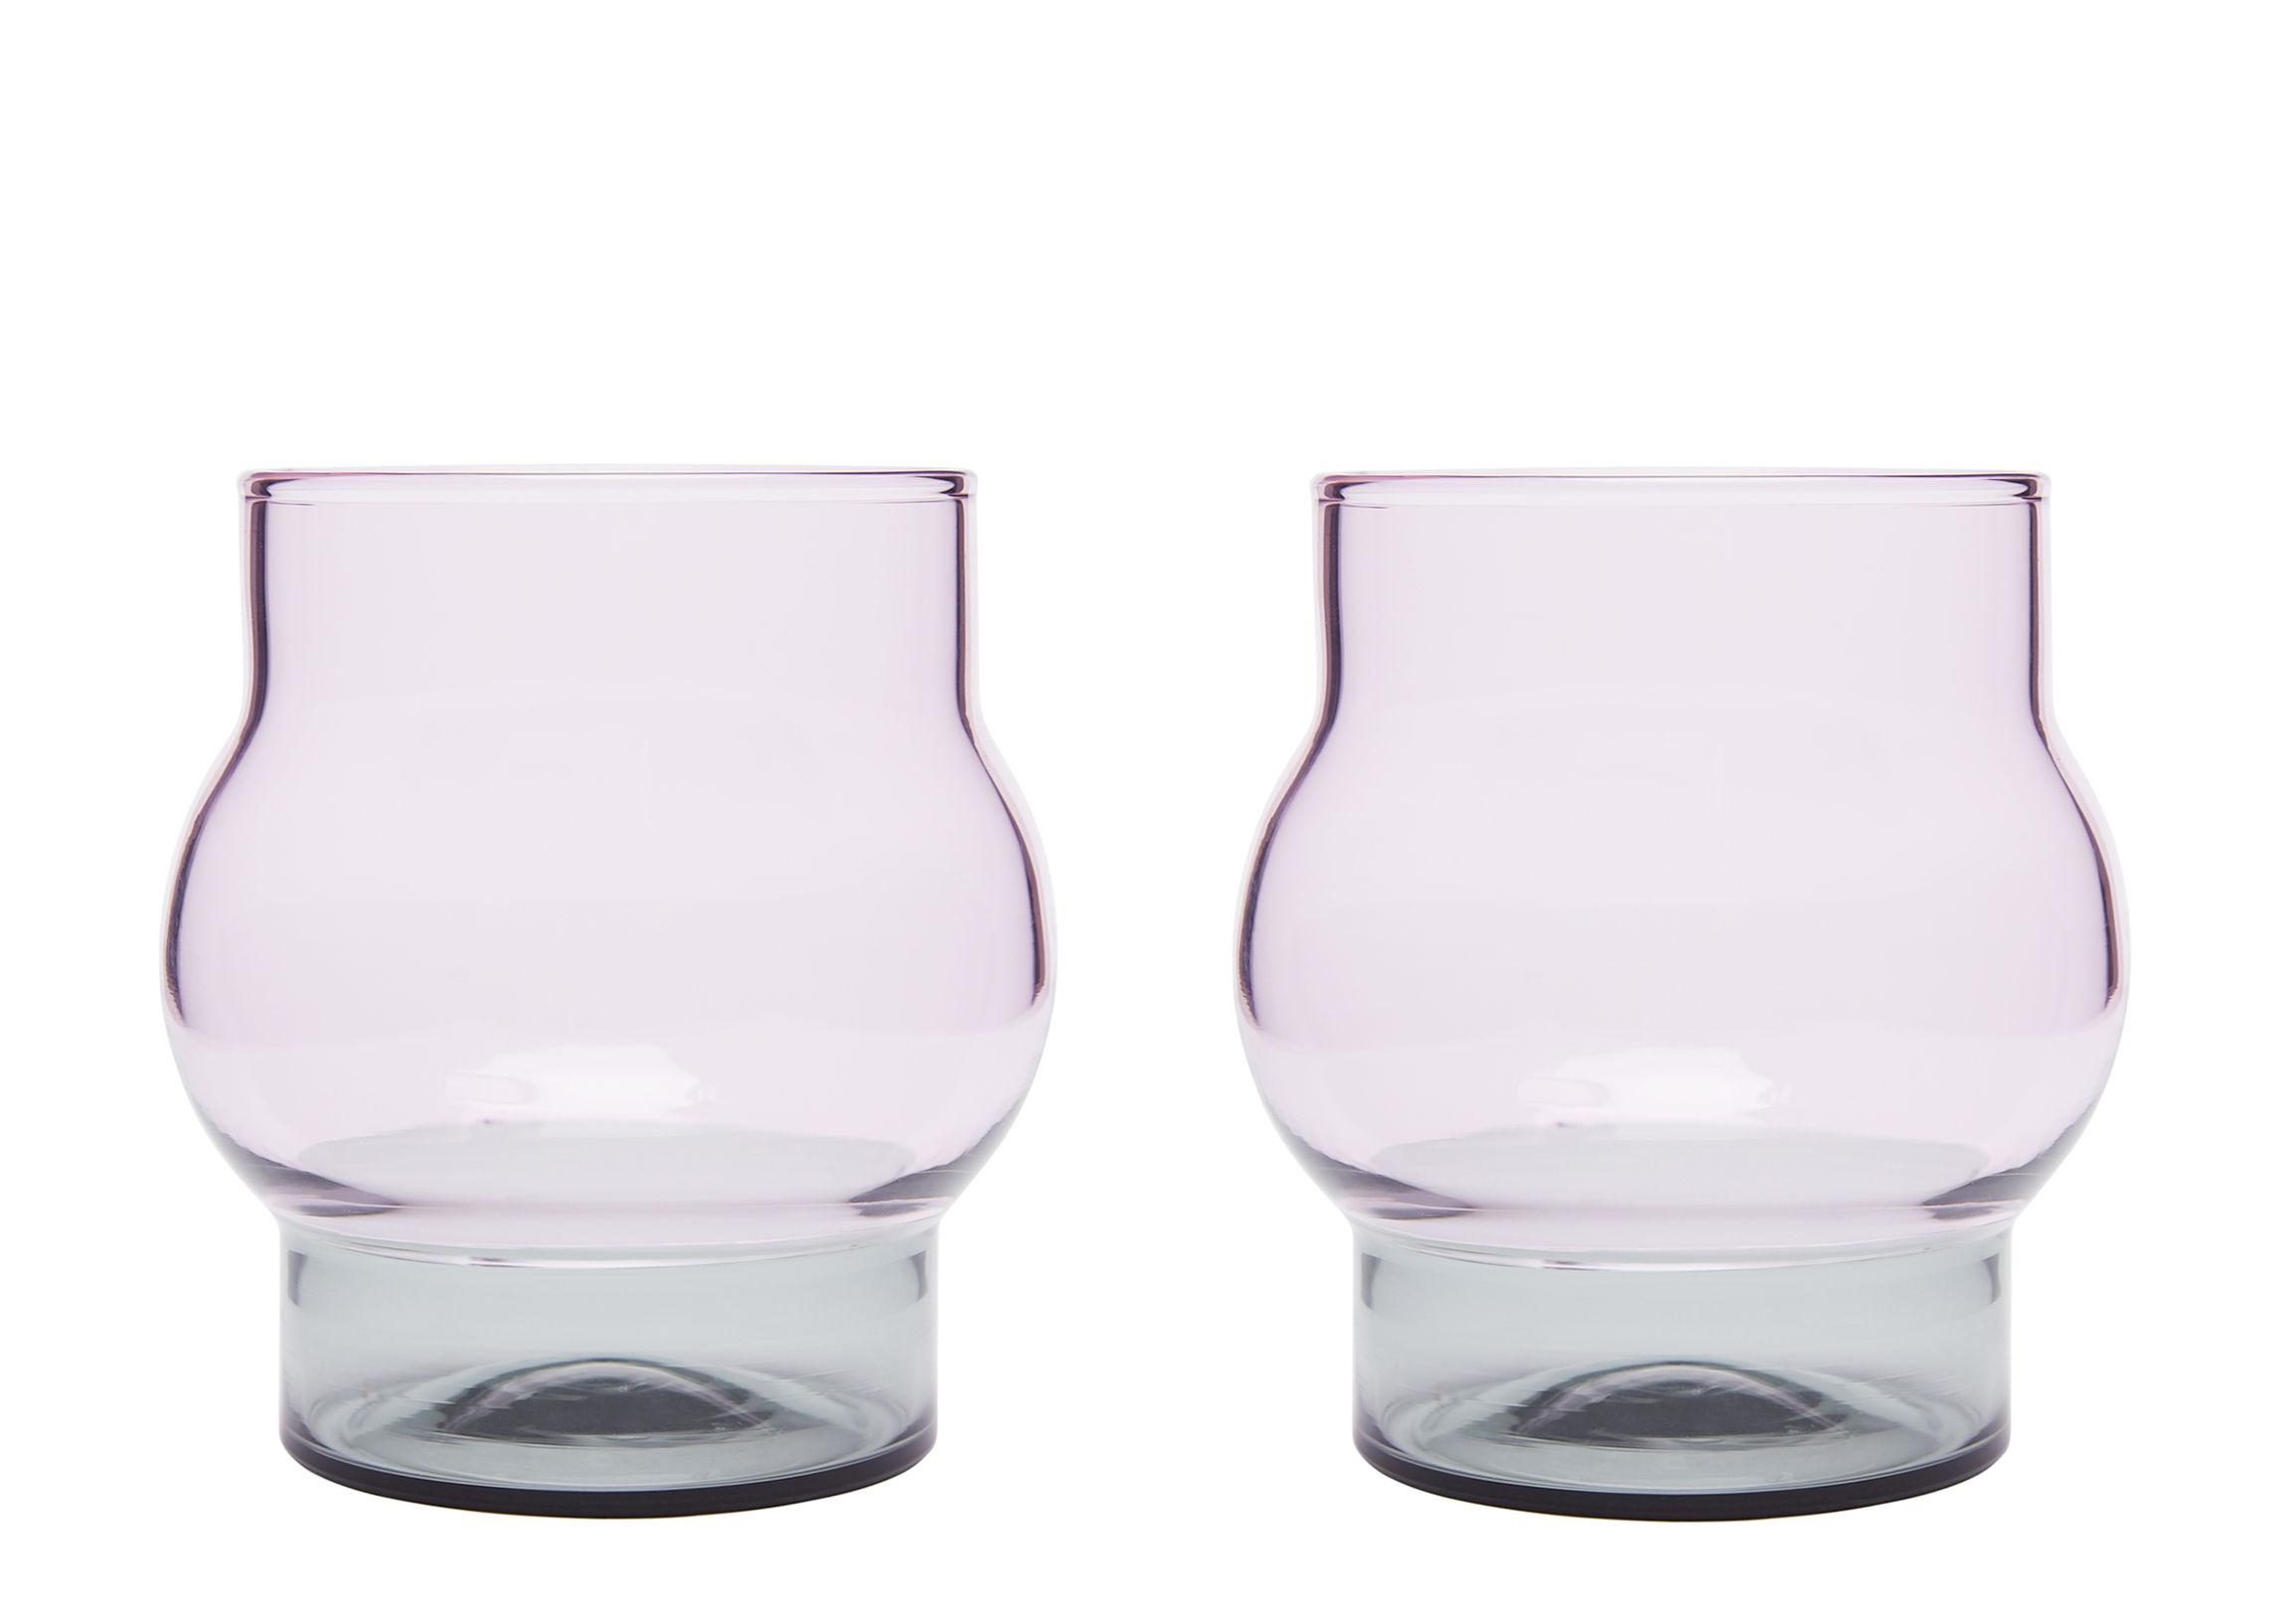 Arts de la table - Verres  - Verre Bump Small / H 9 cm - Set de 2 - Tom Dixon - H 9 cm / Gris & rose - Verre borosilicate soufflé